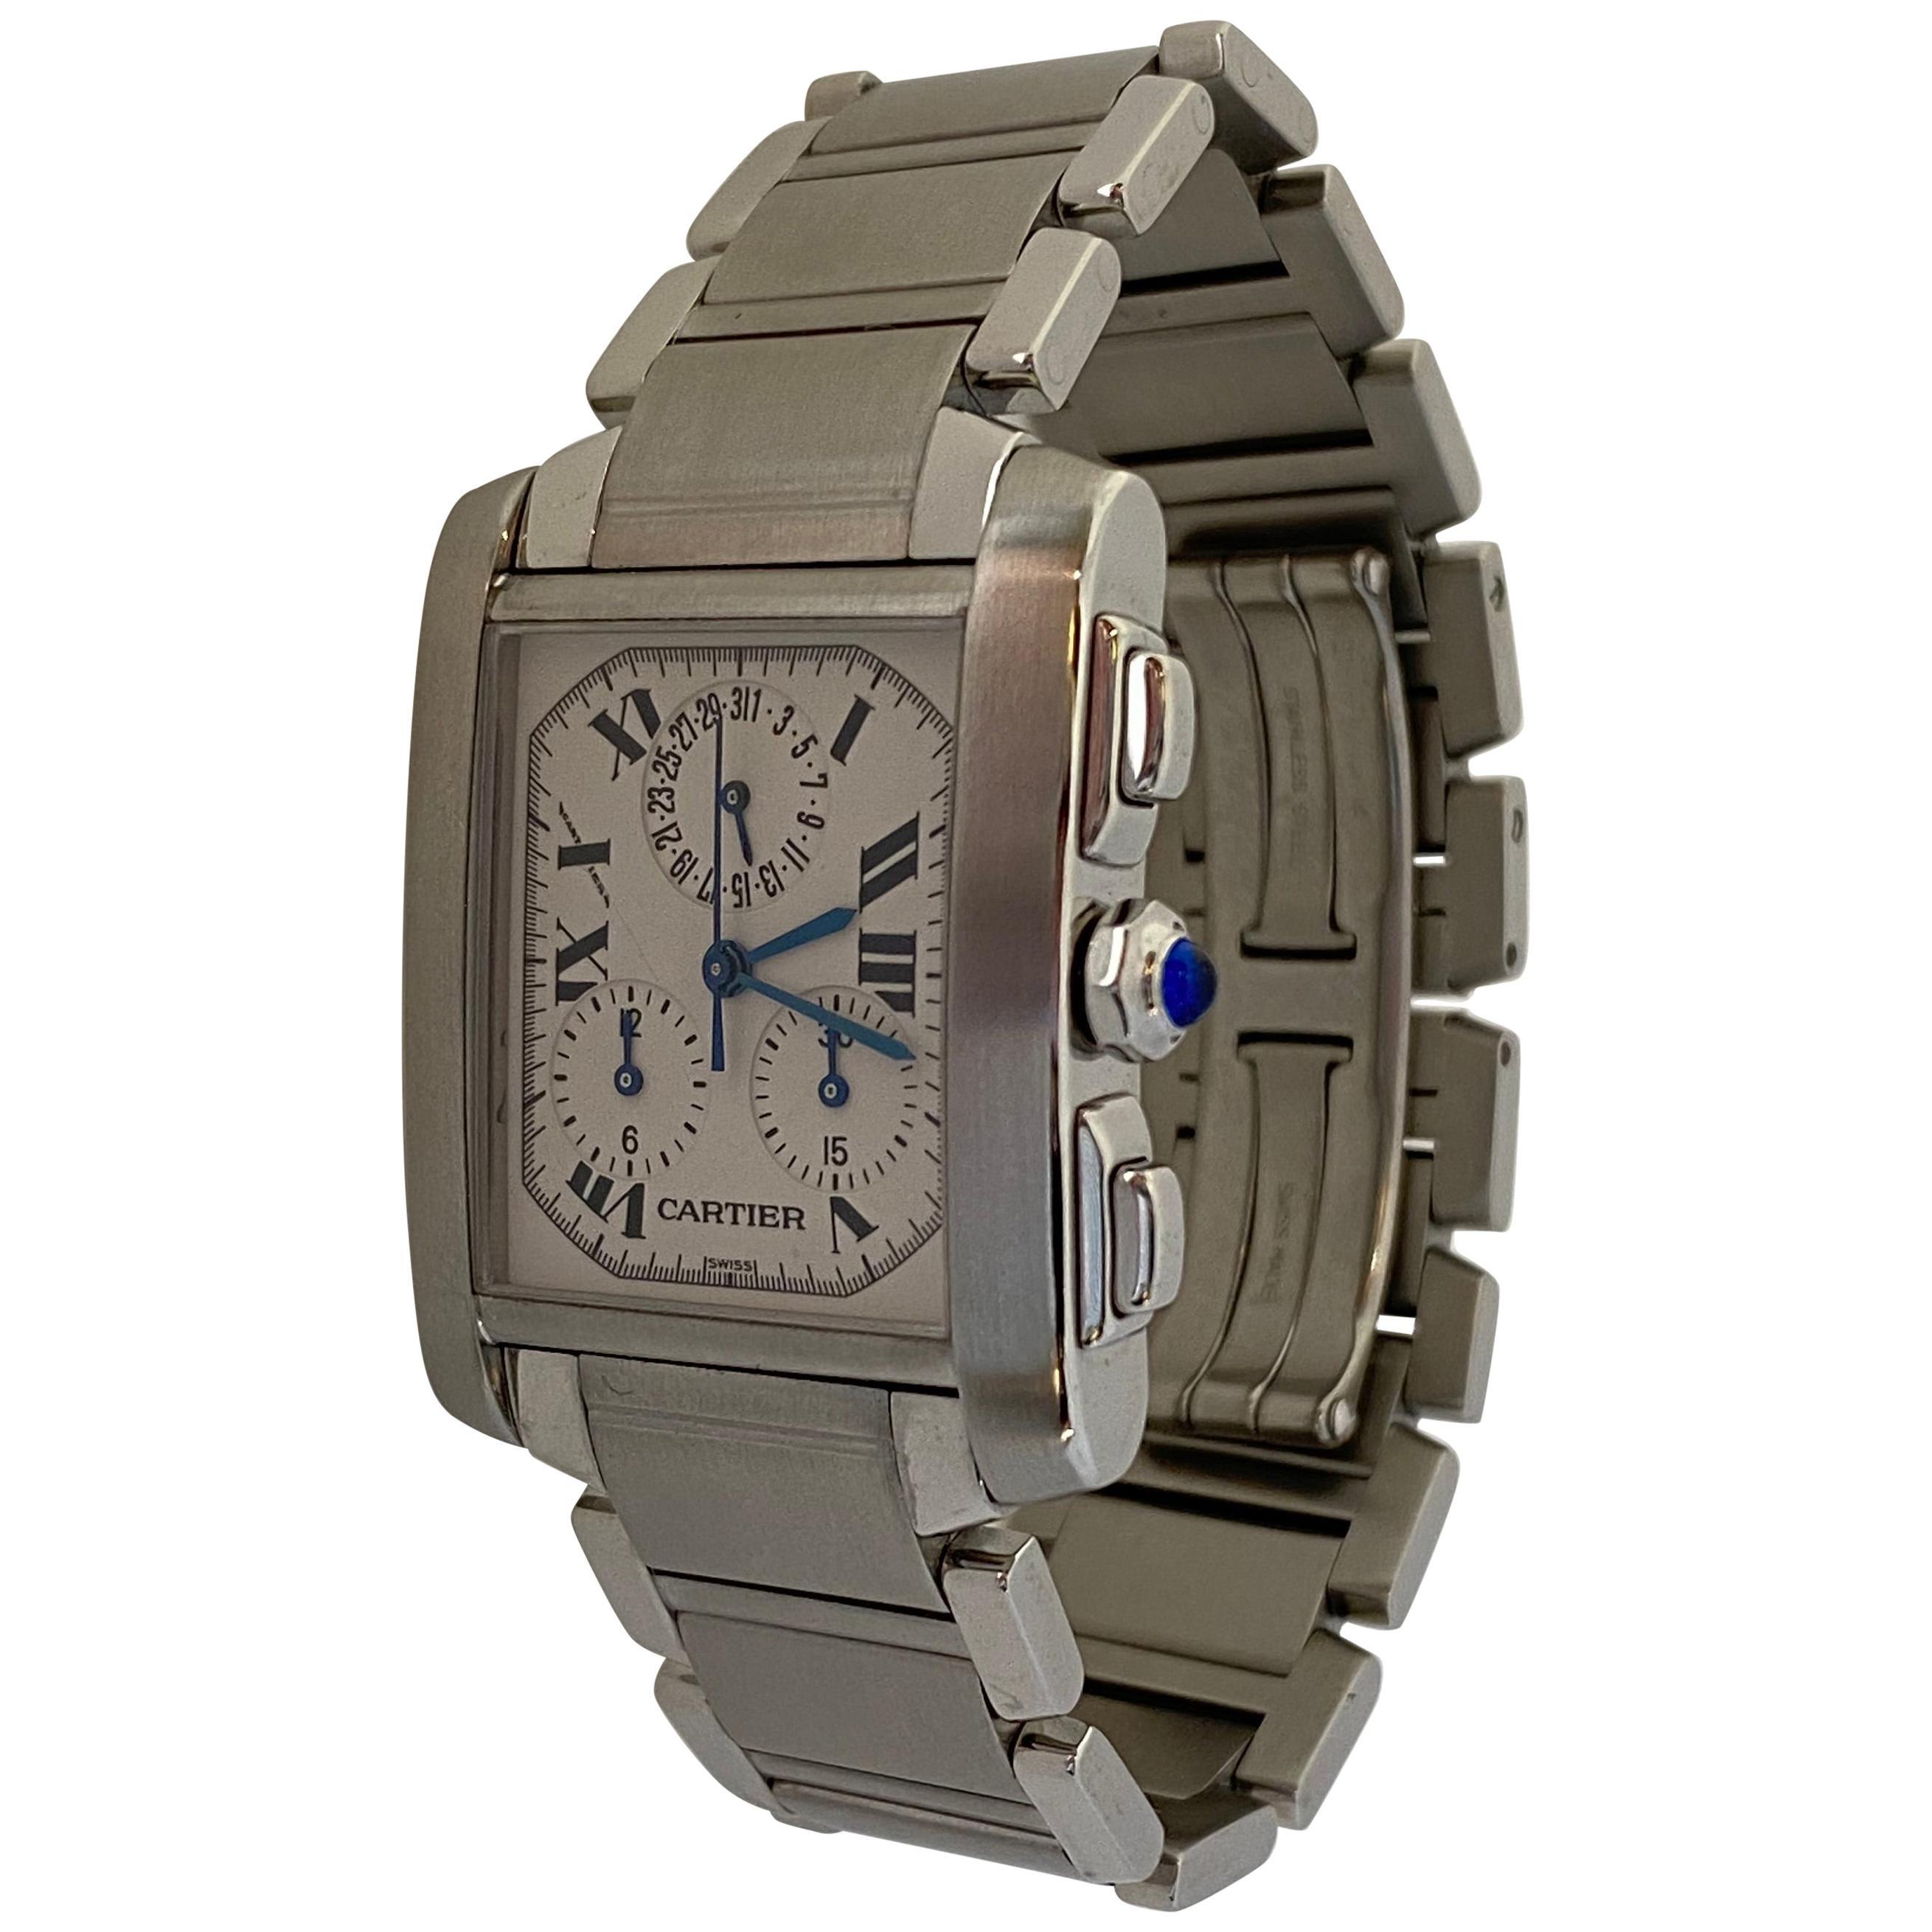 Cartier Tank Francaise Chronoreflex Steel Watch Quartz W51001Q3 2303